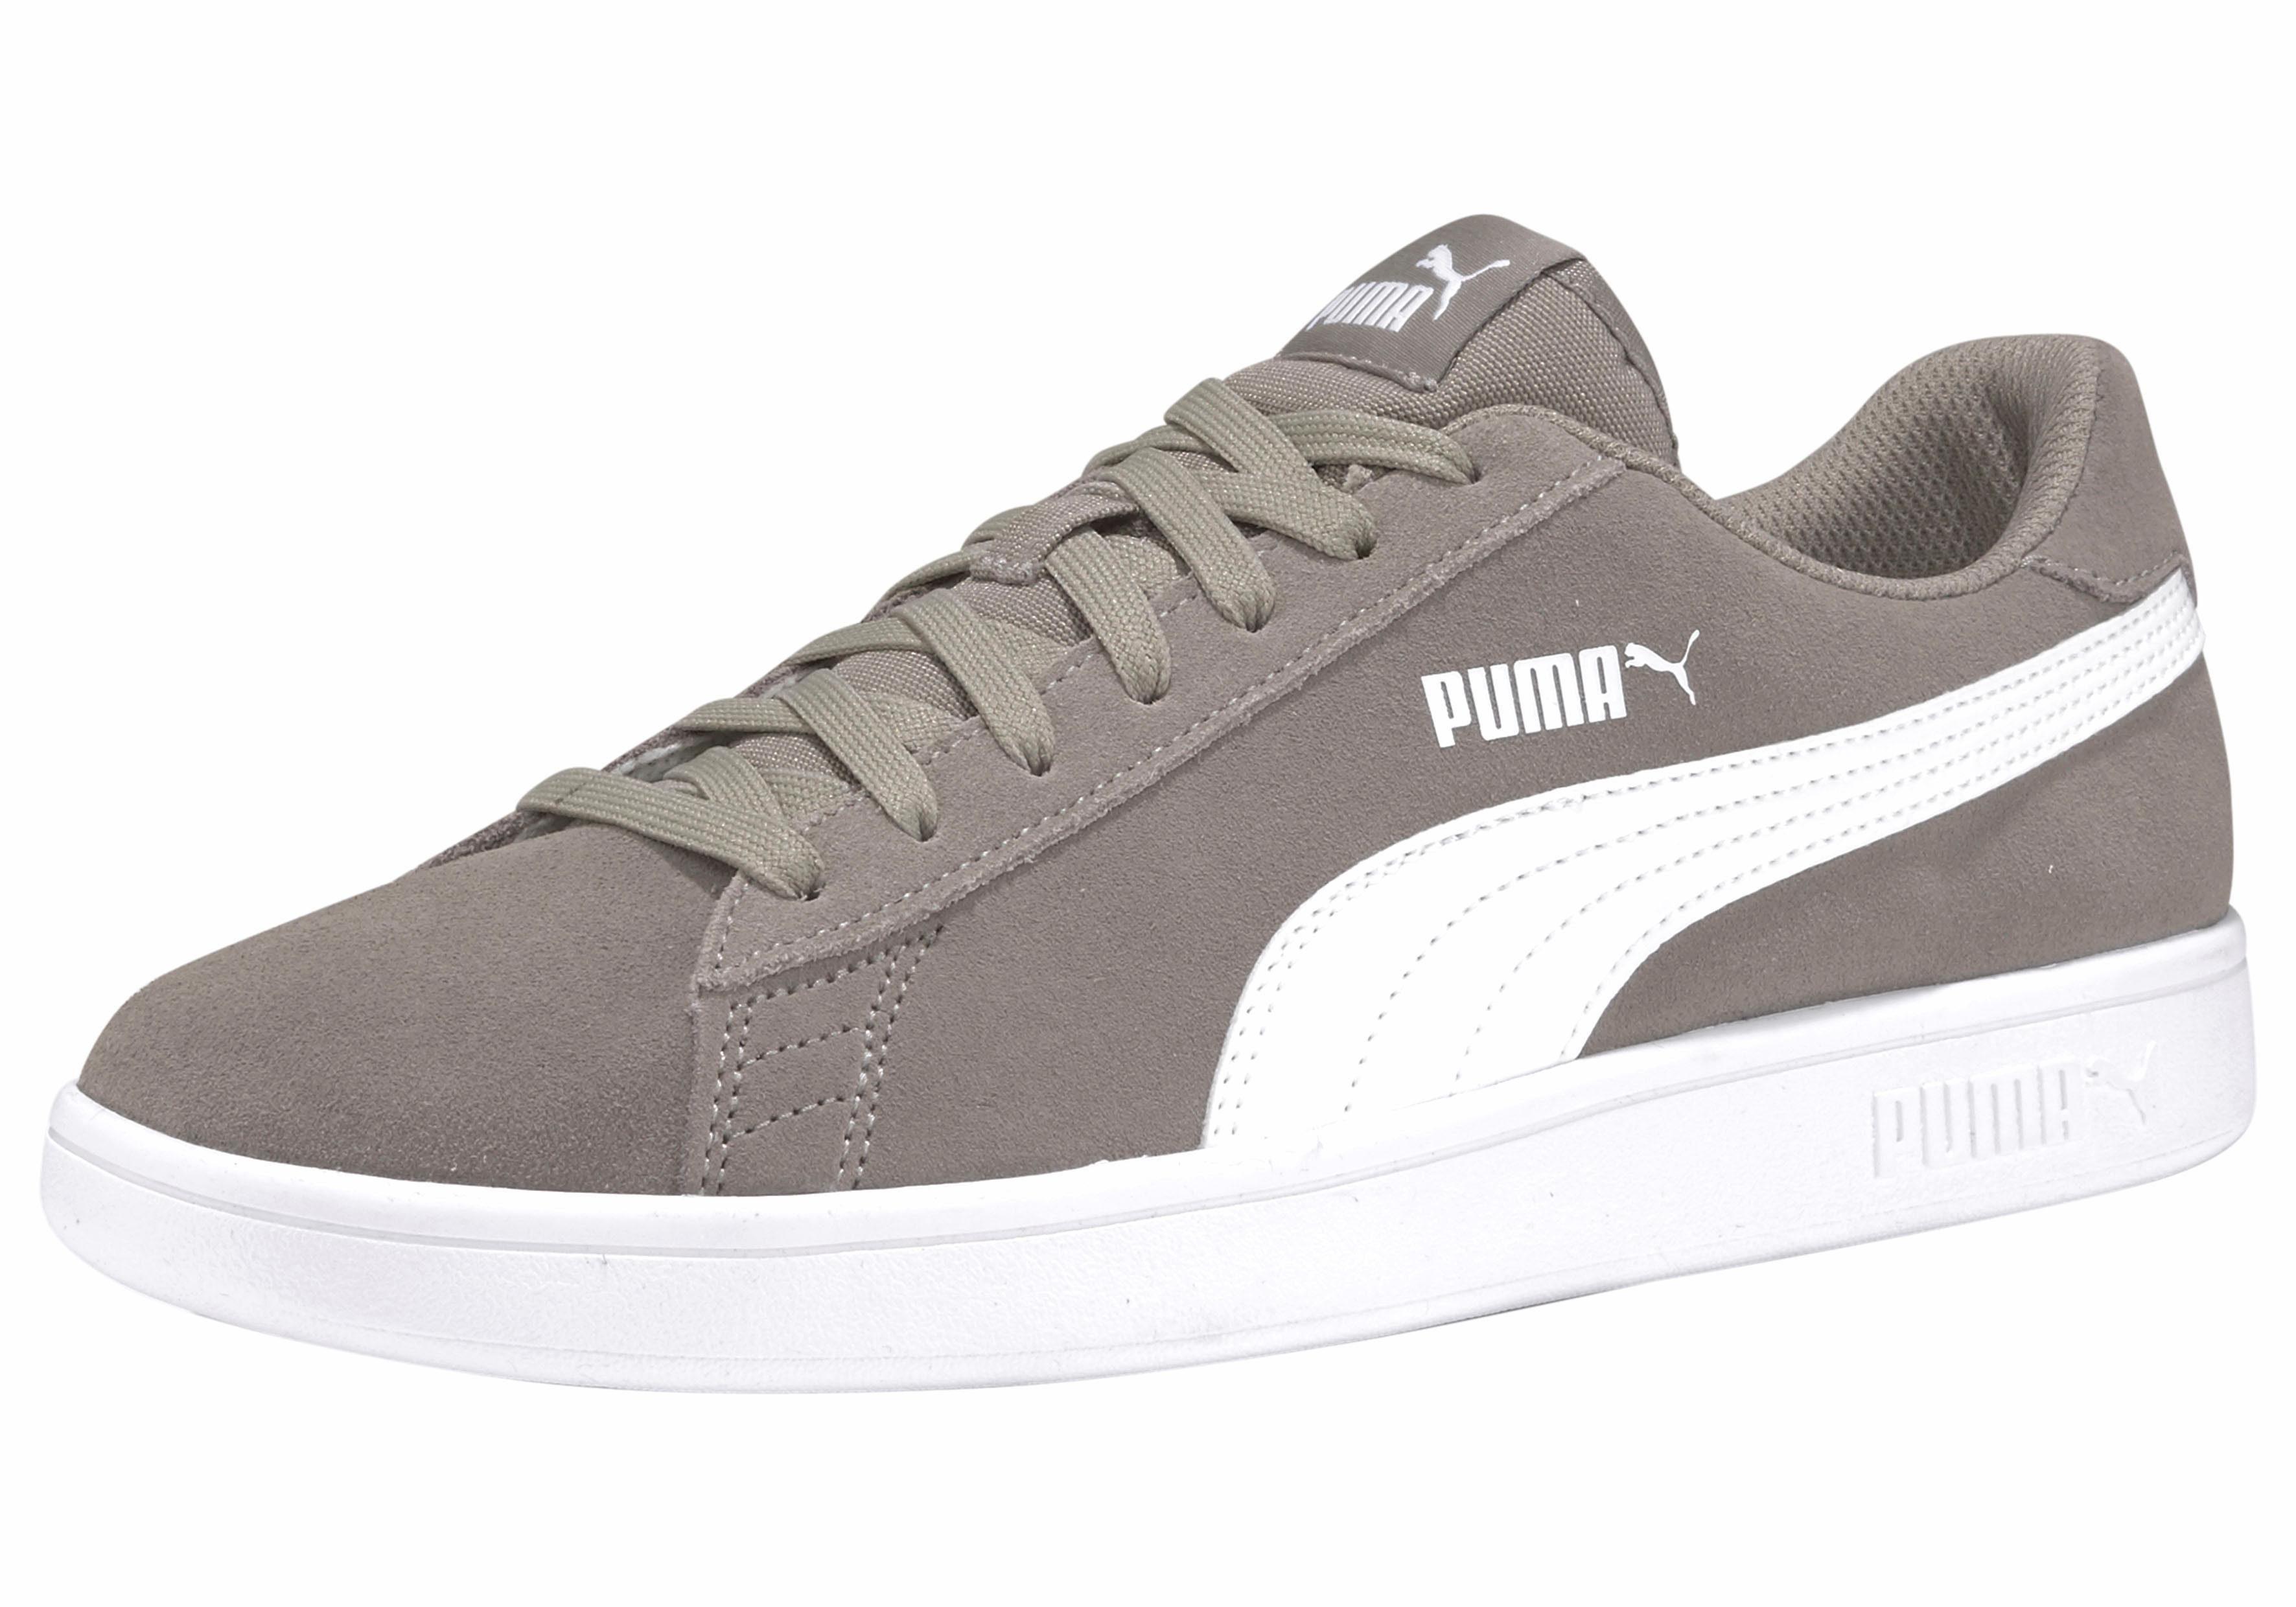 PUMA Smash V2 Sneaker online kaufen  grau-weiß